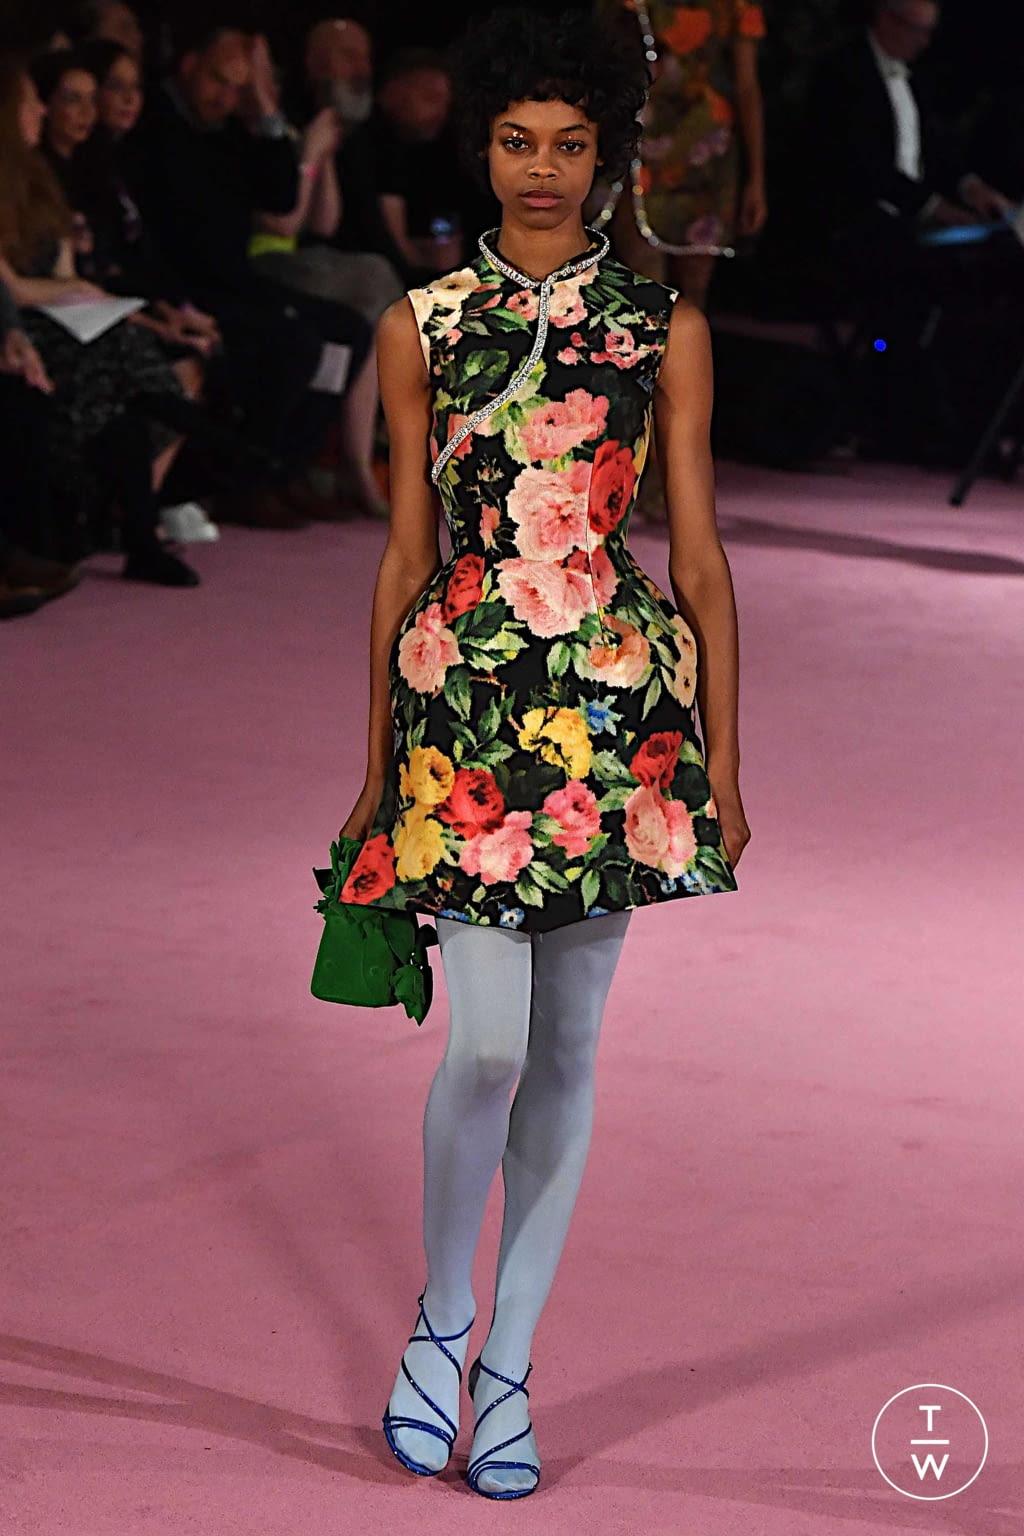 vestido-flores-richard-quinn